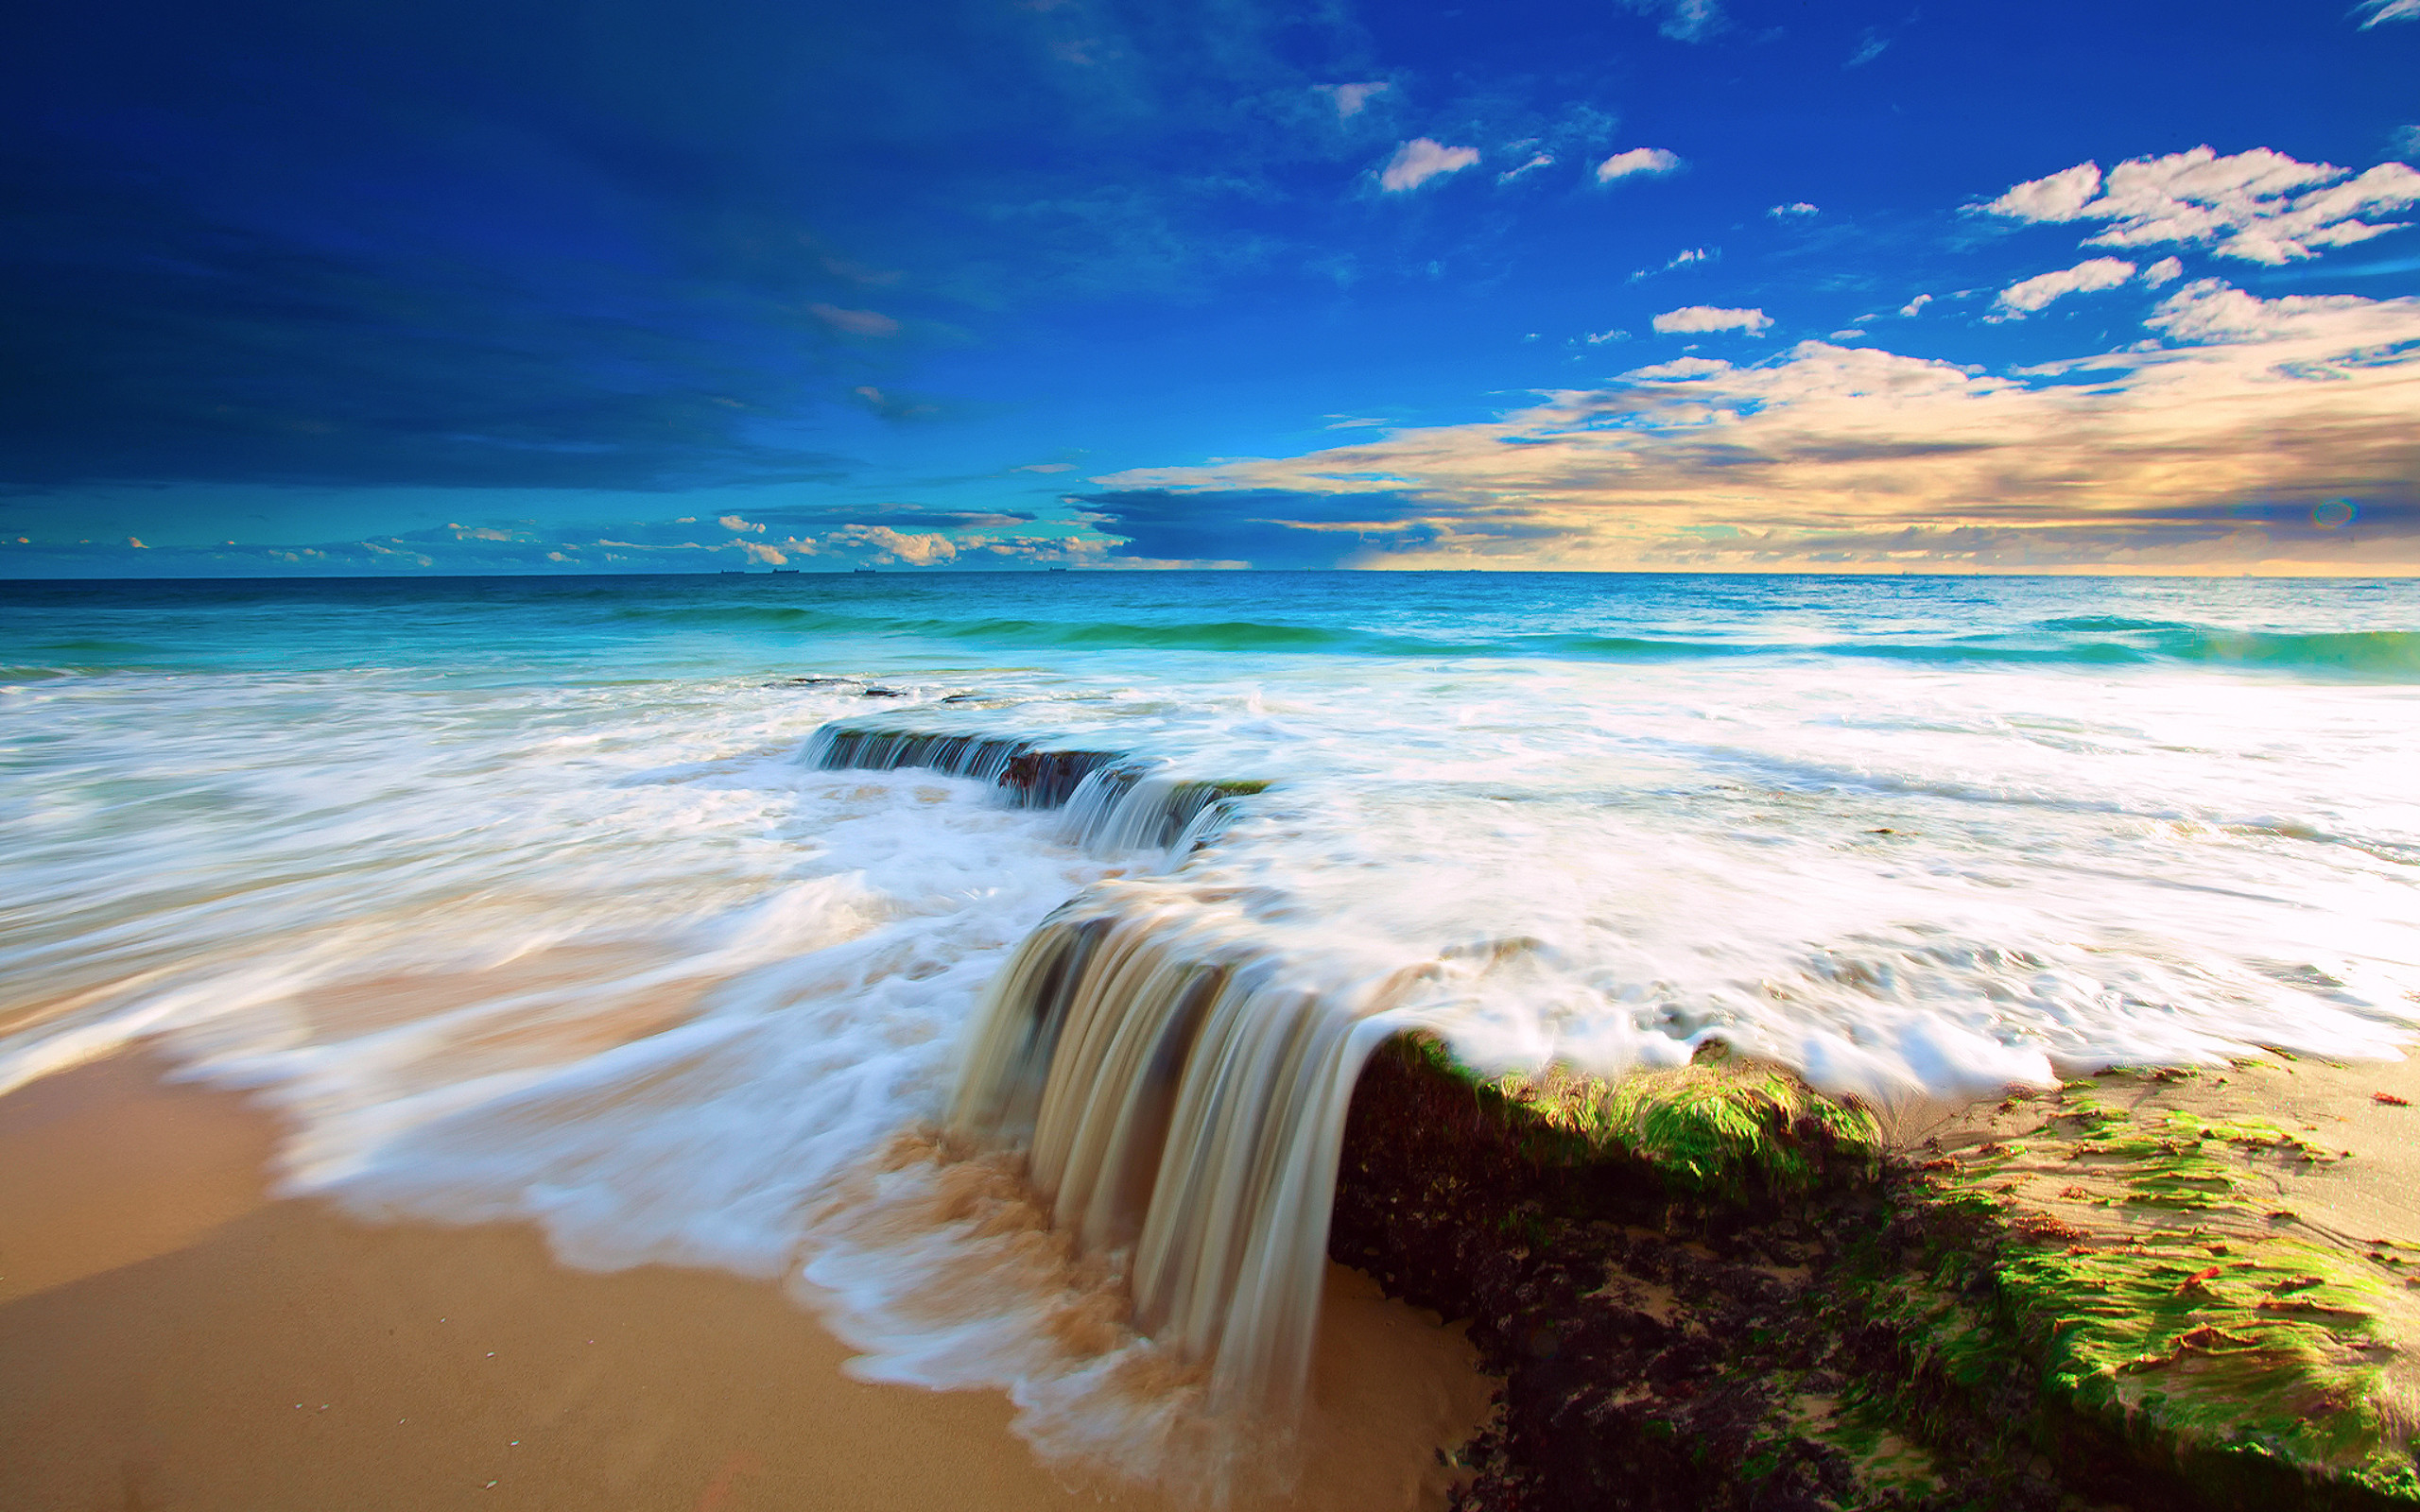 the ocean wallpapers category of free hd wallpapers ocean scenes is .